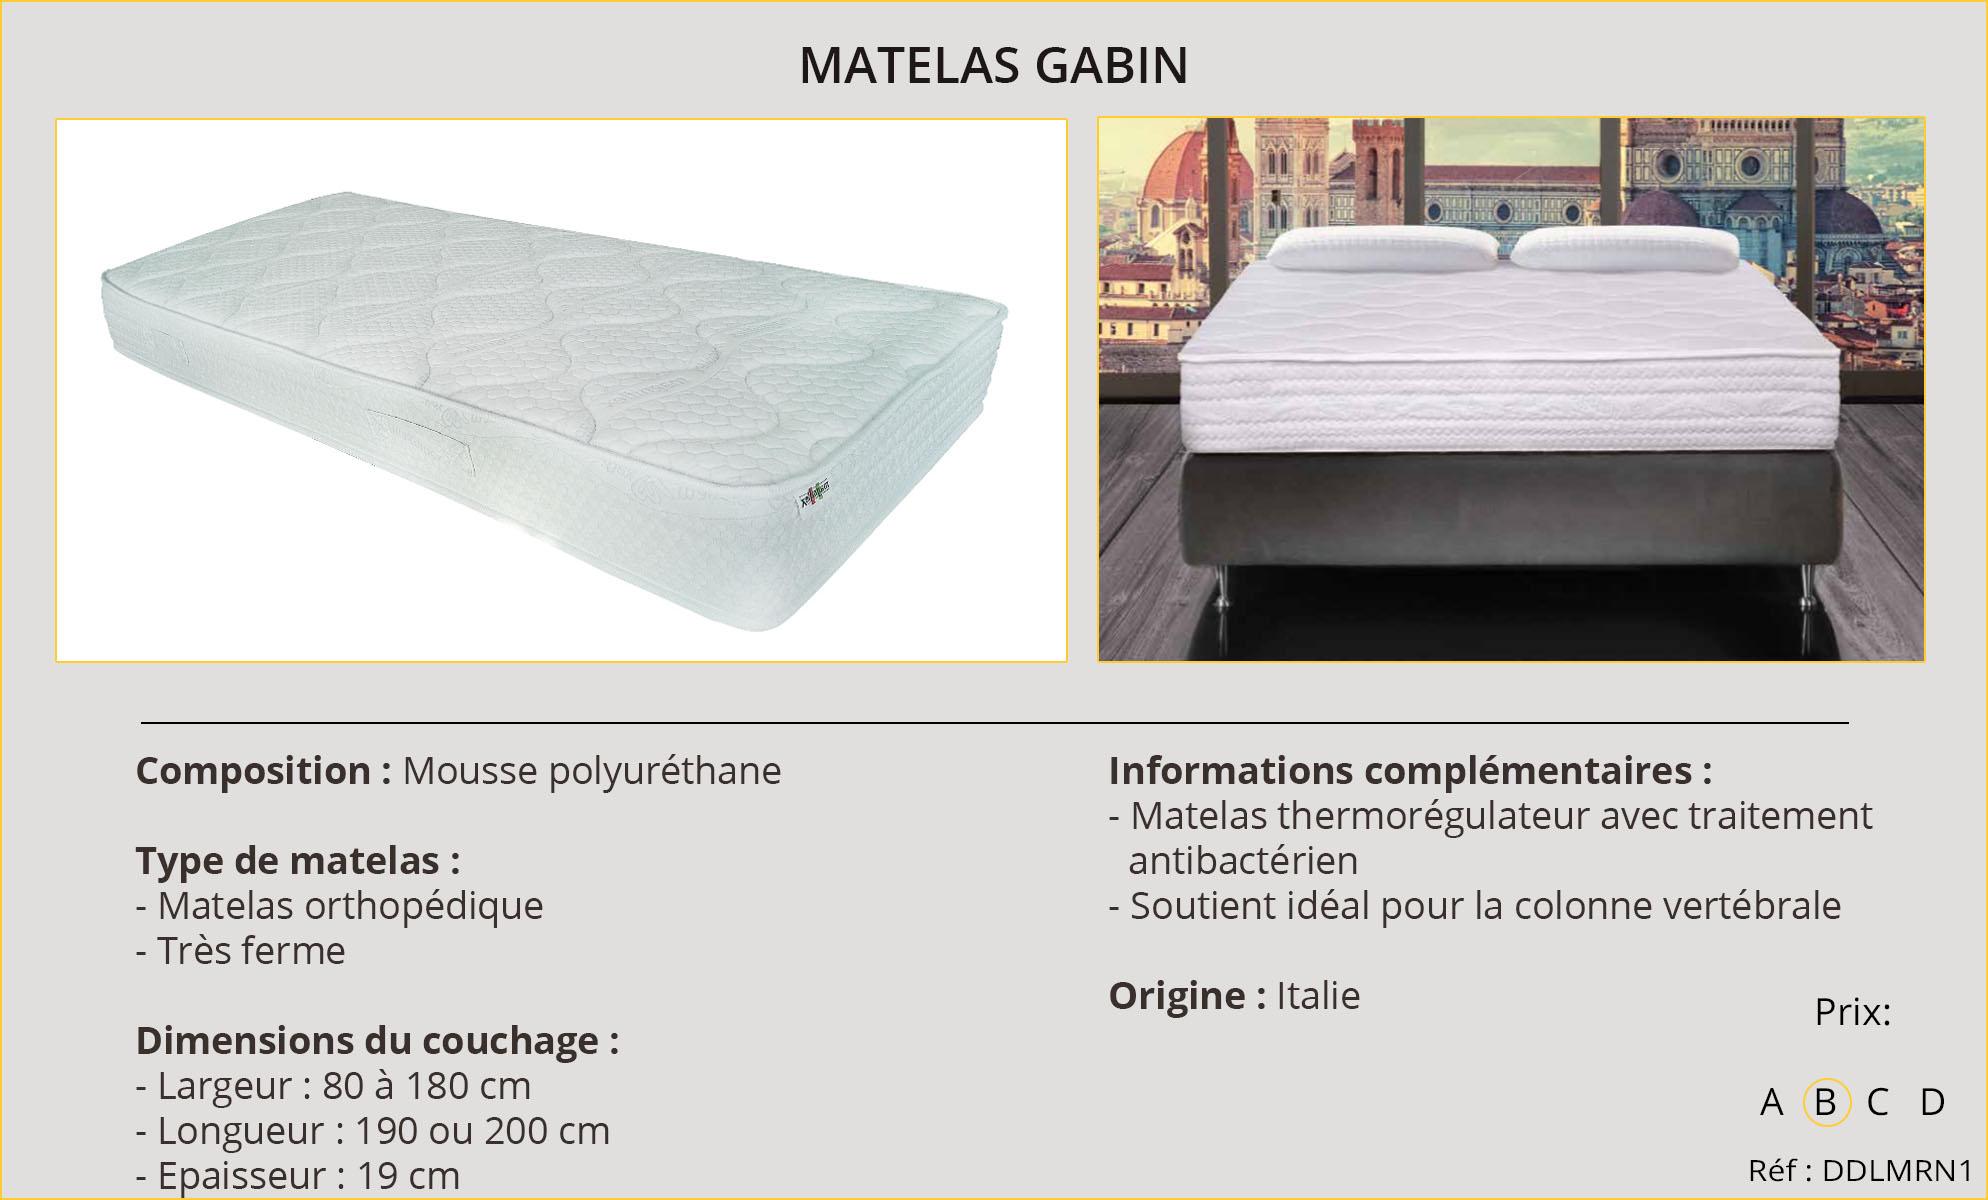 Rideaux-Hôtels Matelas Gabin